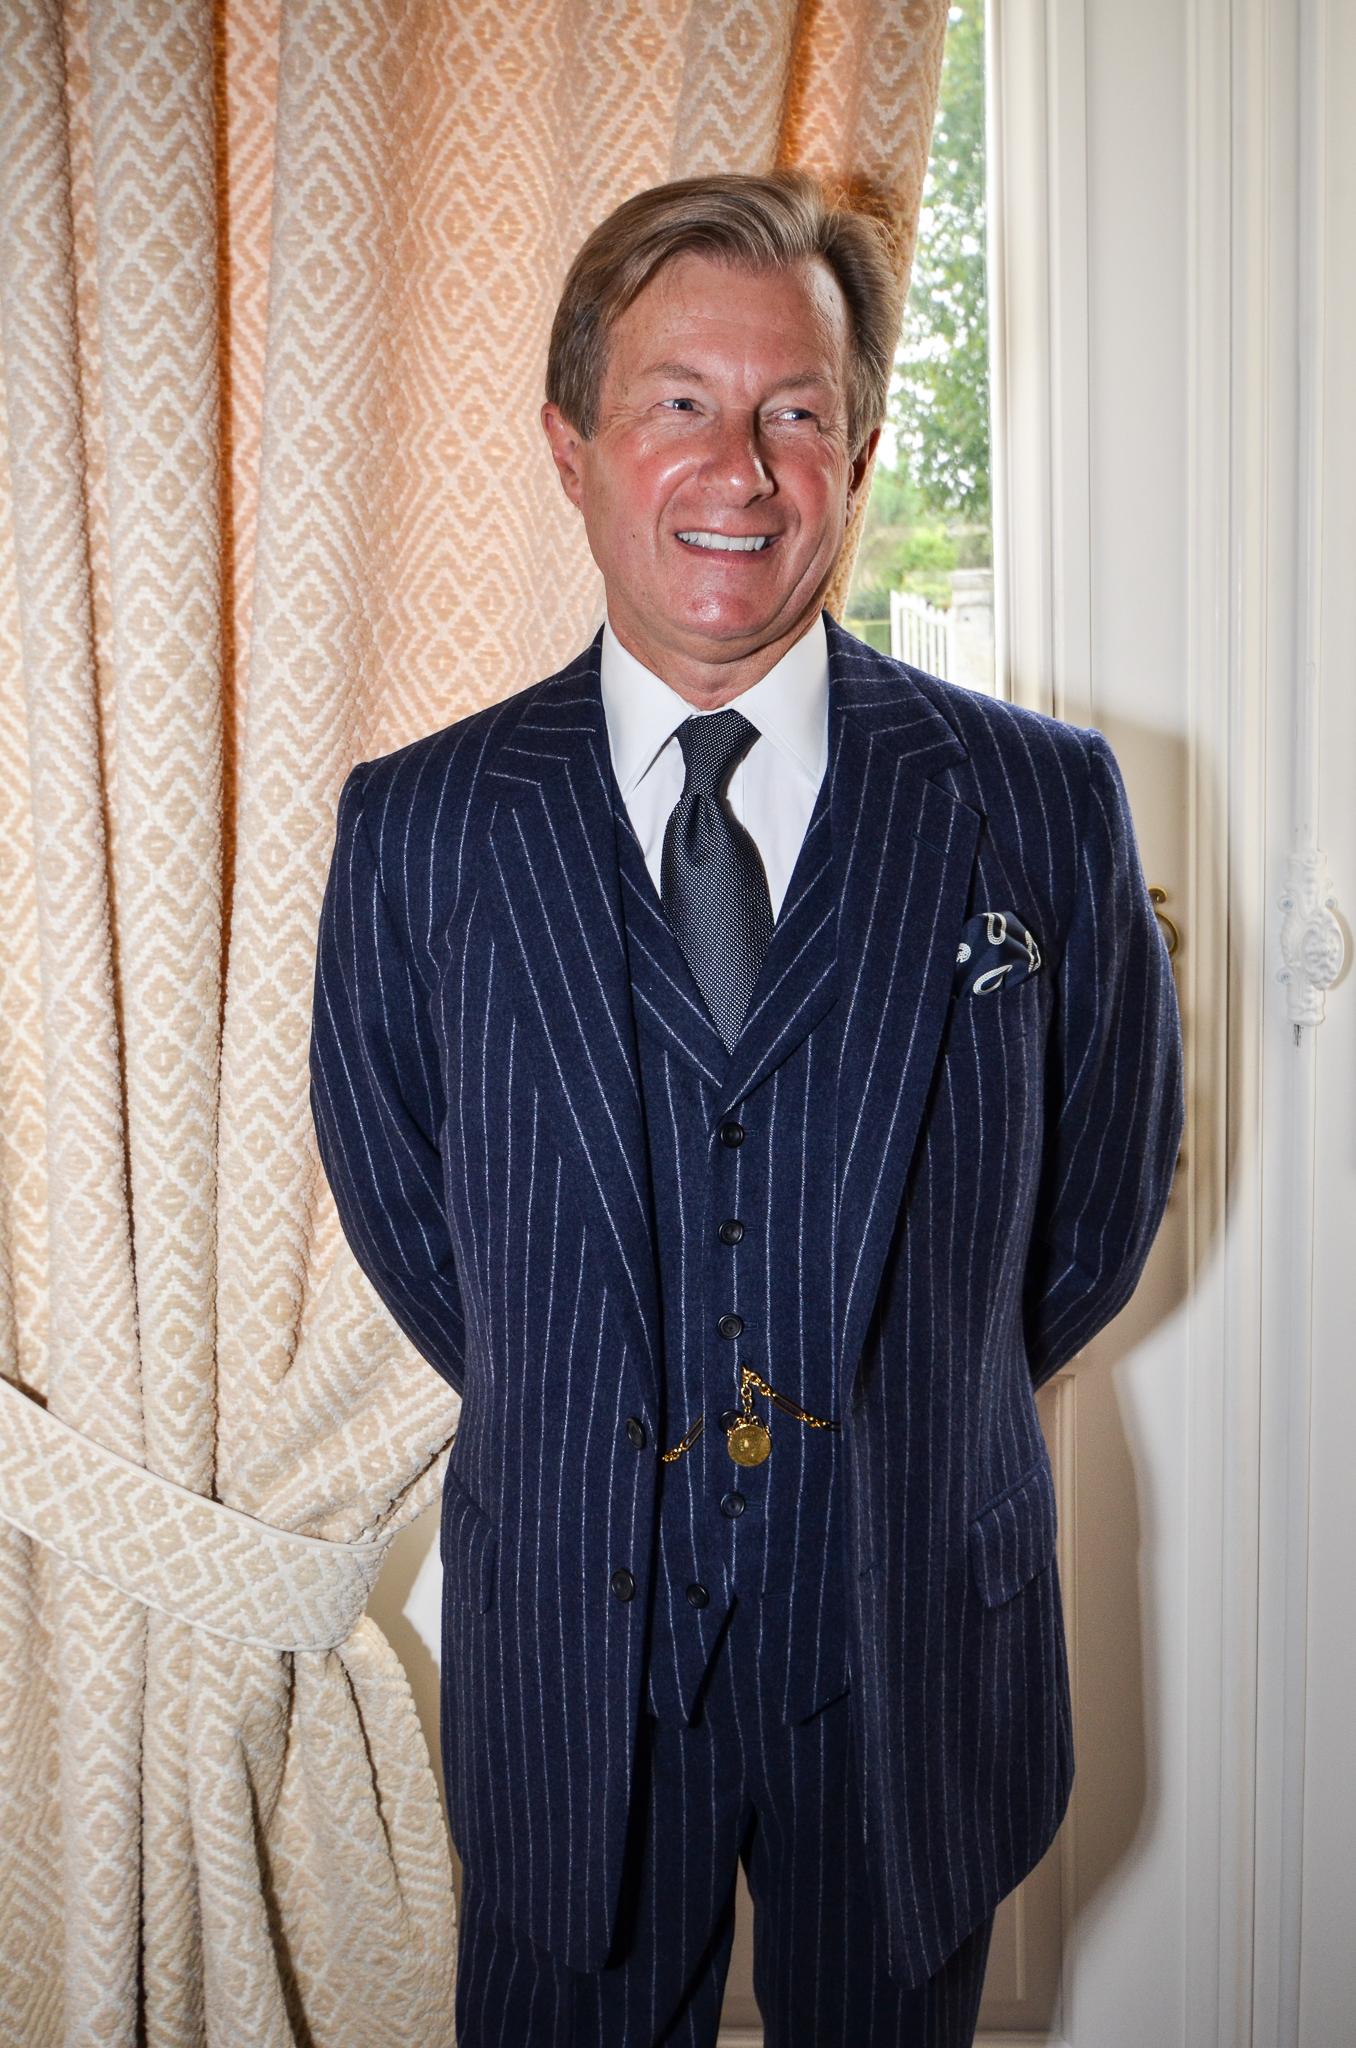 Garments-25-3-Piece-Blue-Chalk-Stripe-Suit-0562.jpg